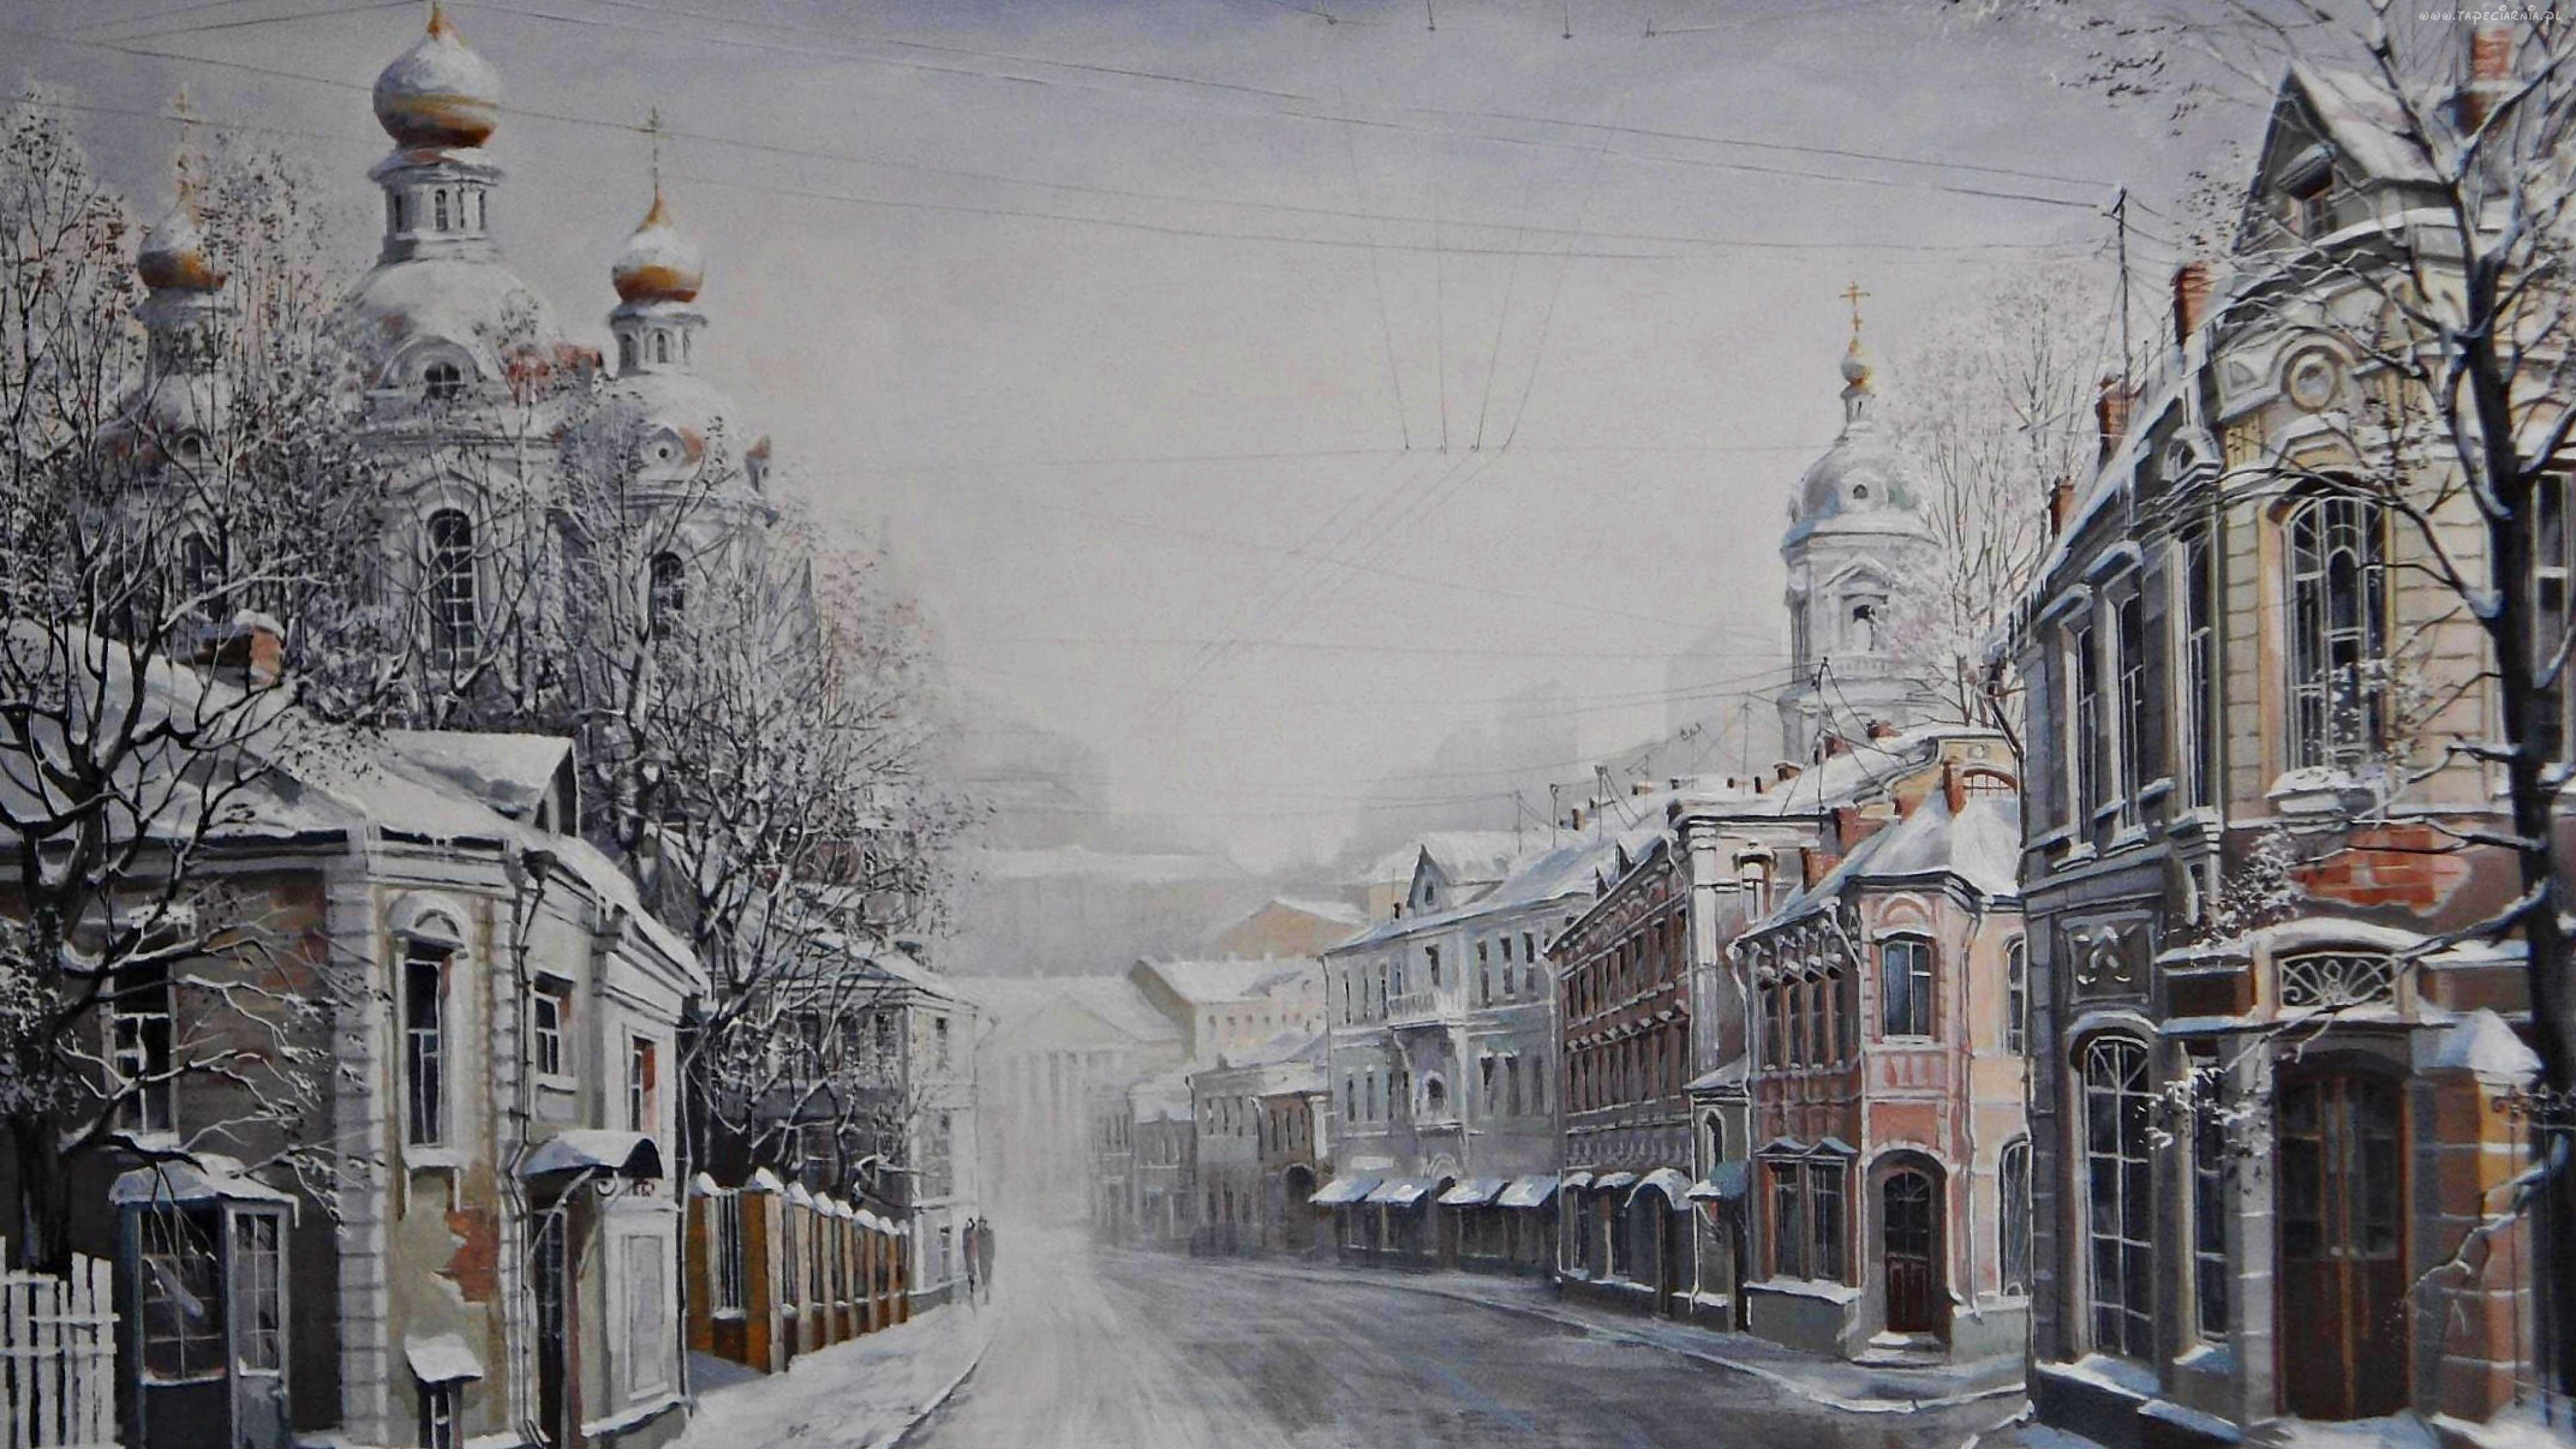 Obraz, Zima, Miasto, Ulica